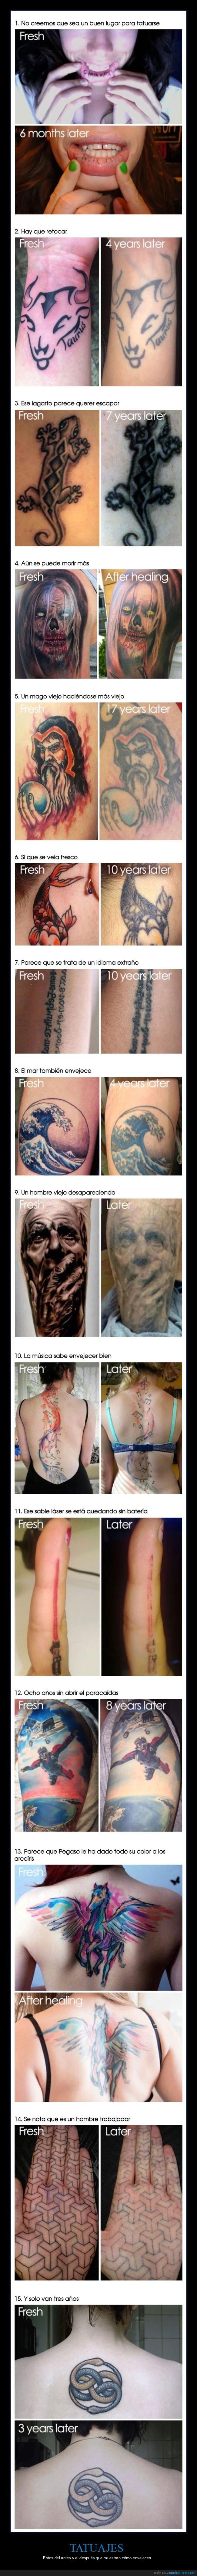 antes,después,envejecer,tatuajes